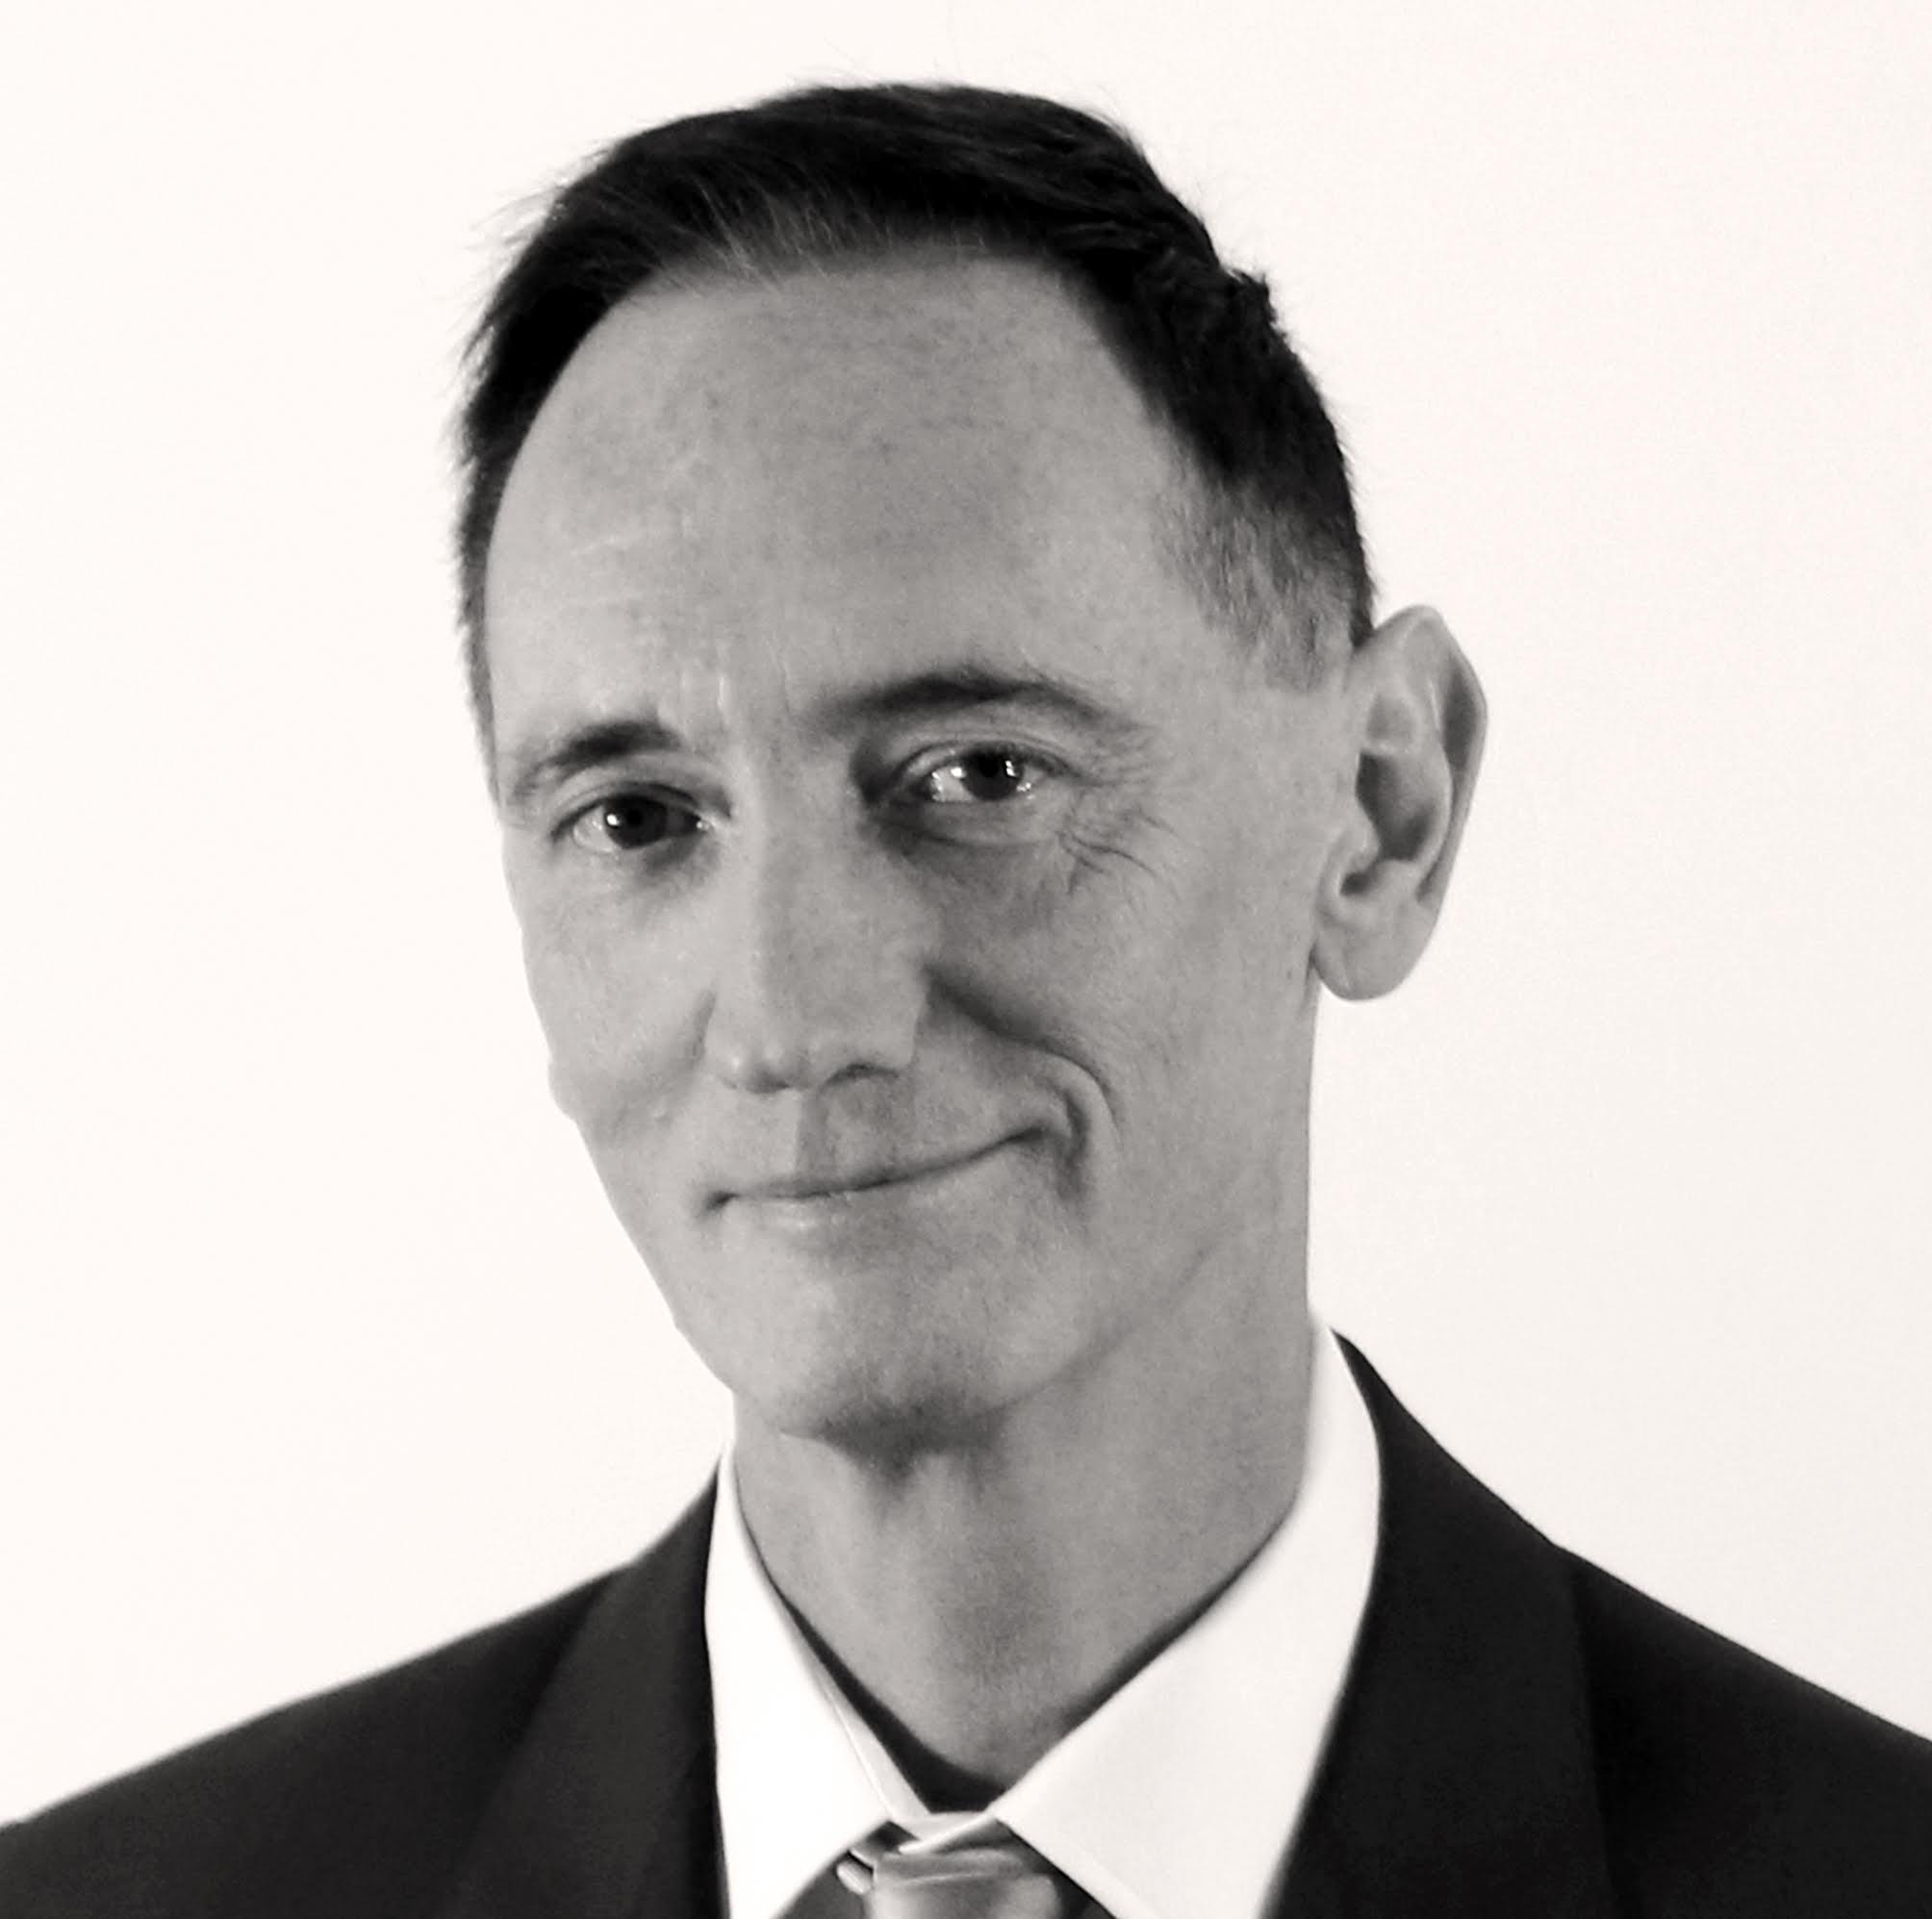 Dr David McDowell, Consultant Spécialiste